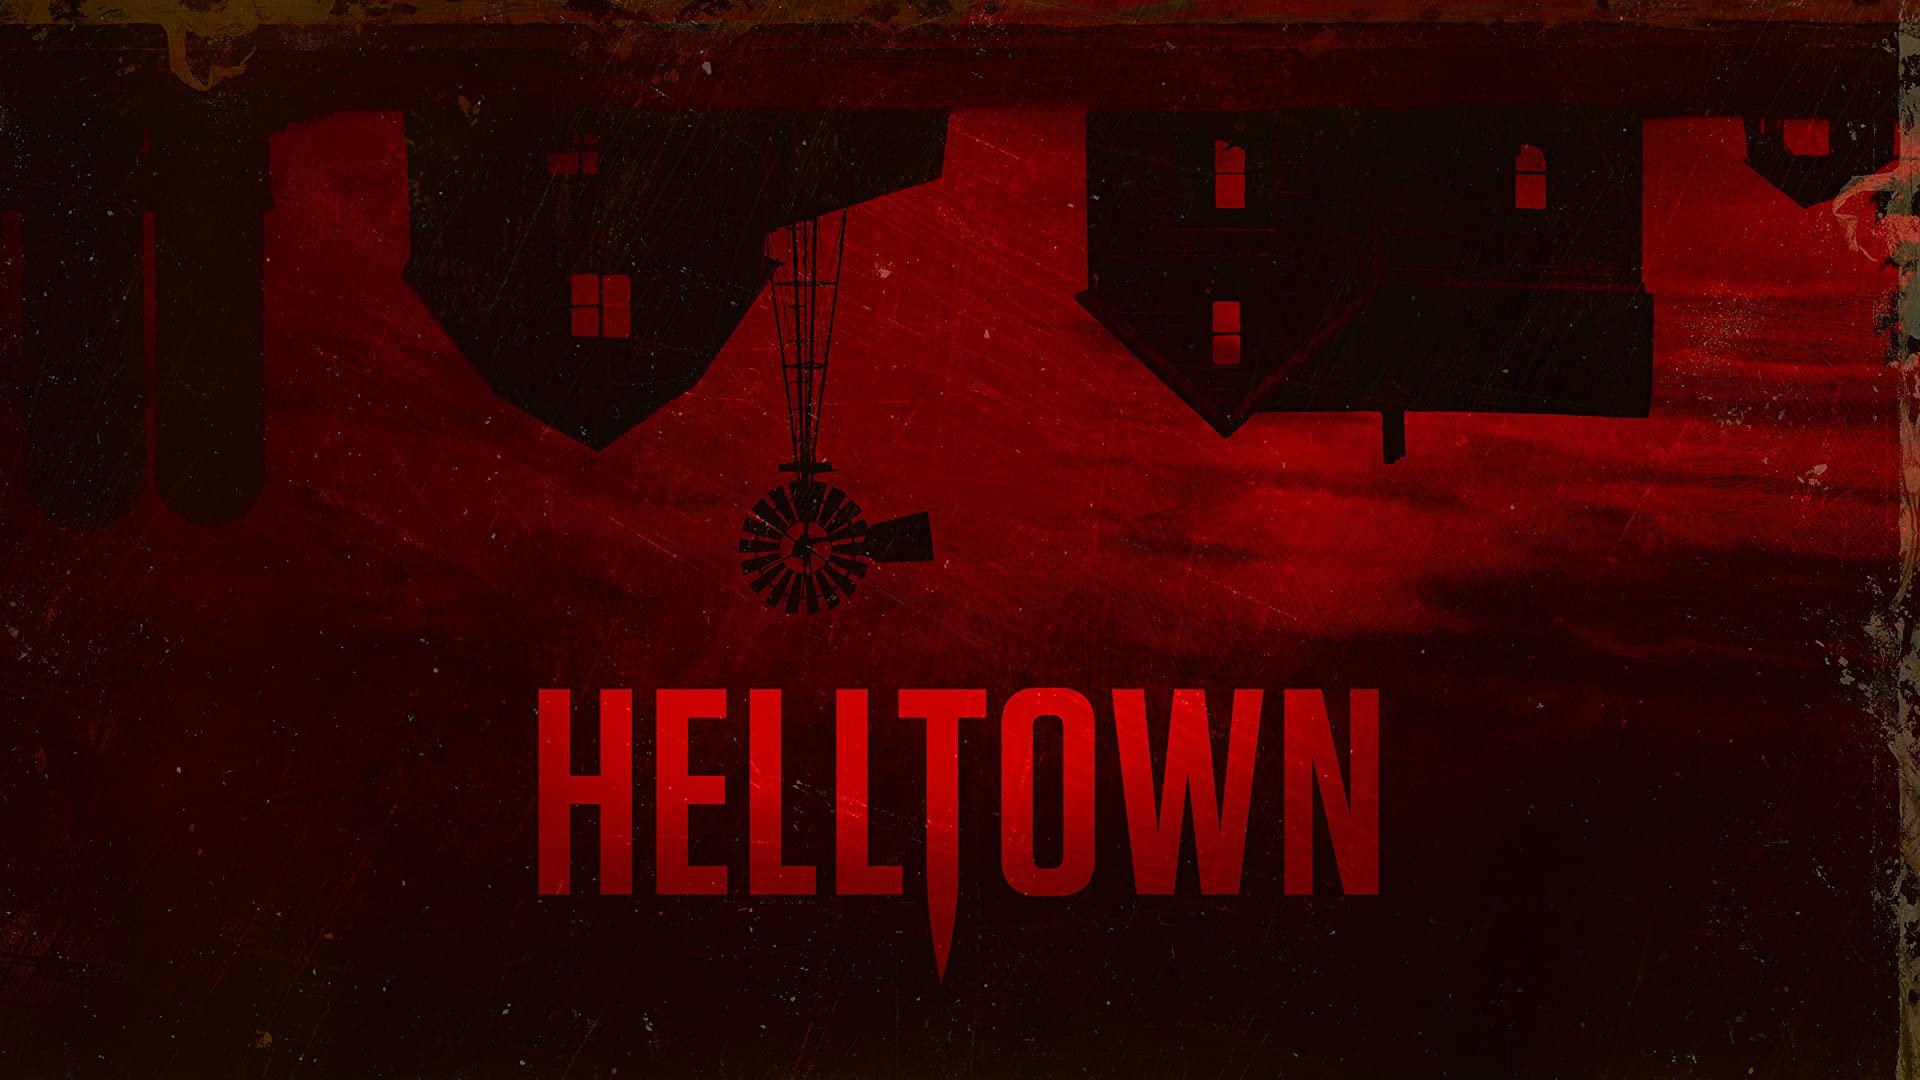 Helltown - Season 1